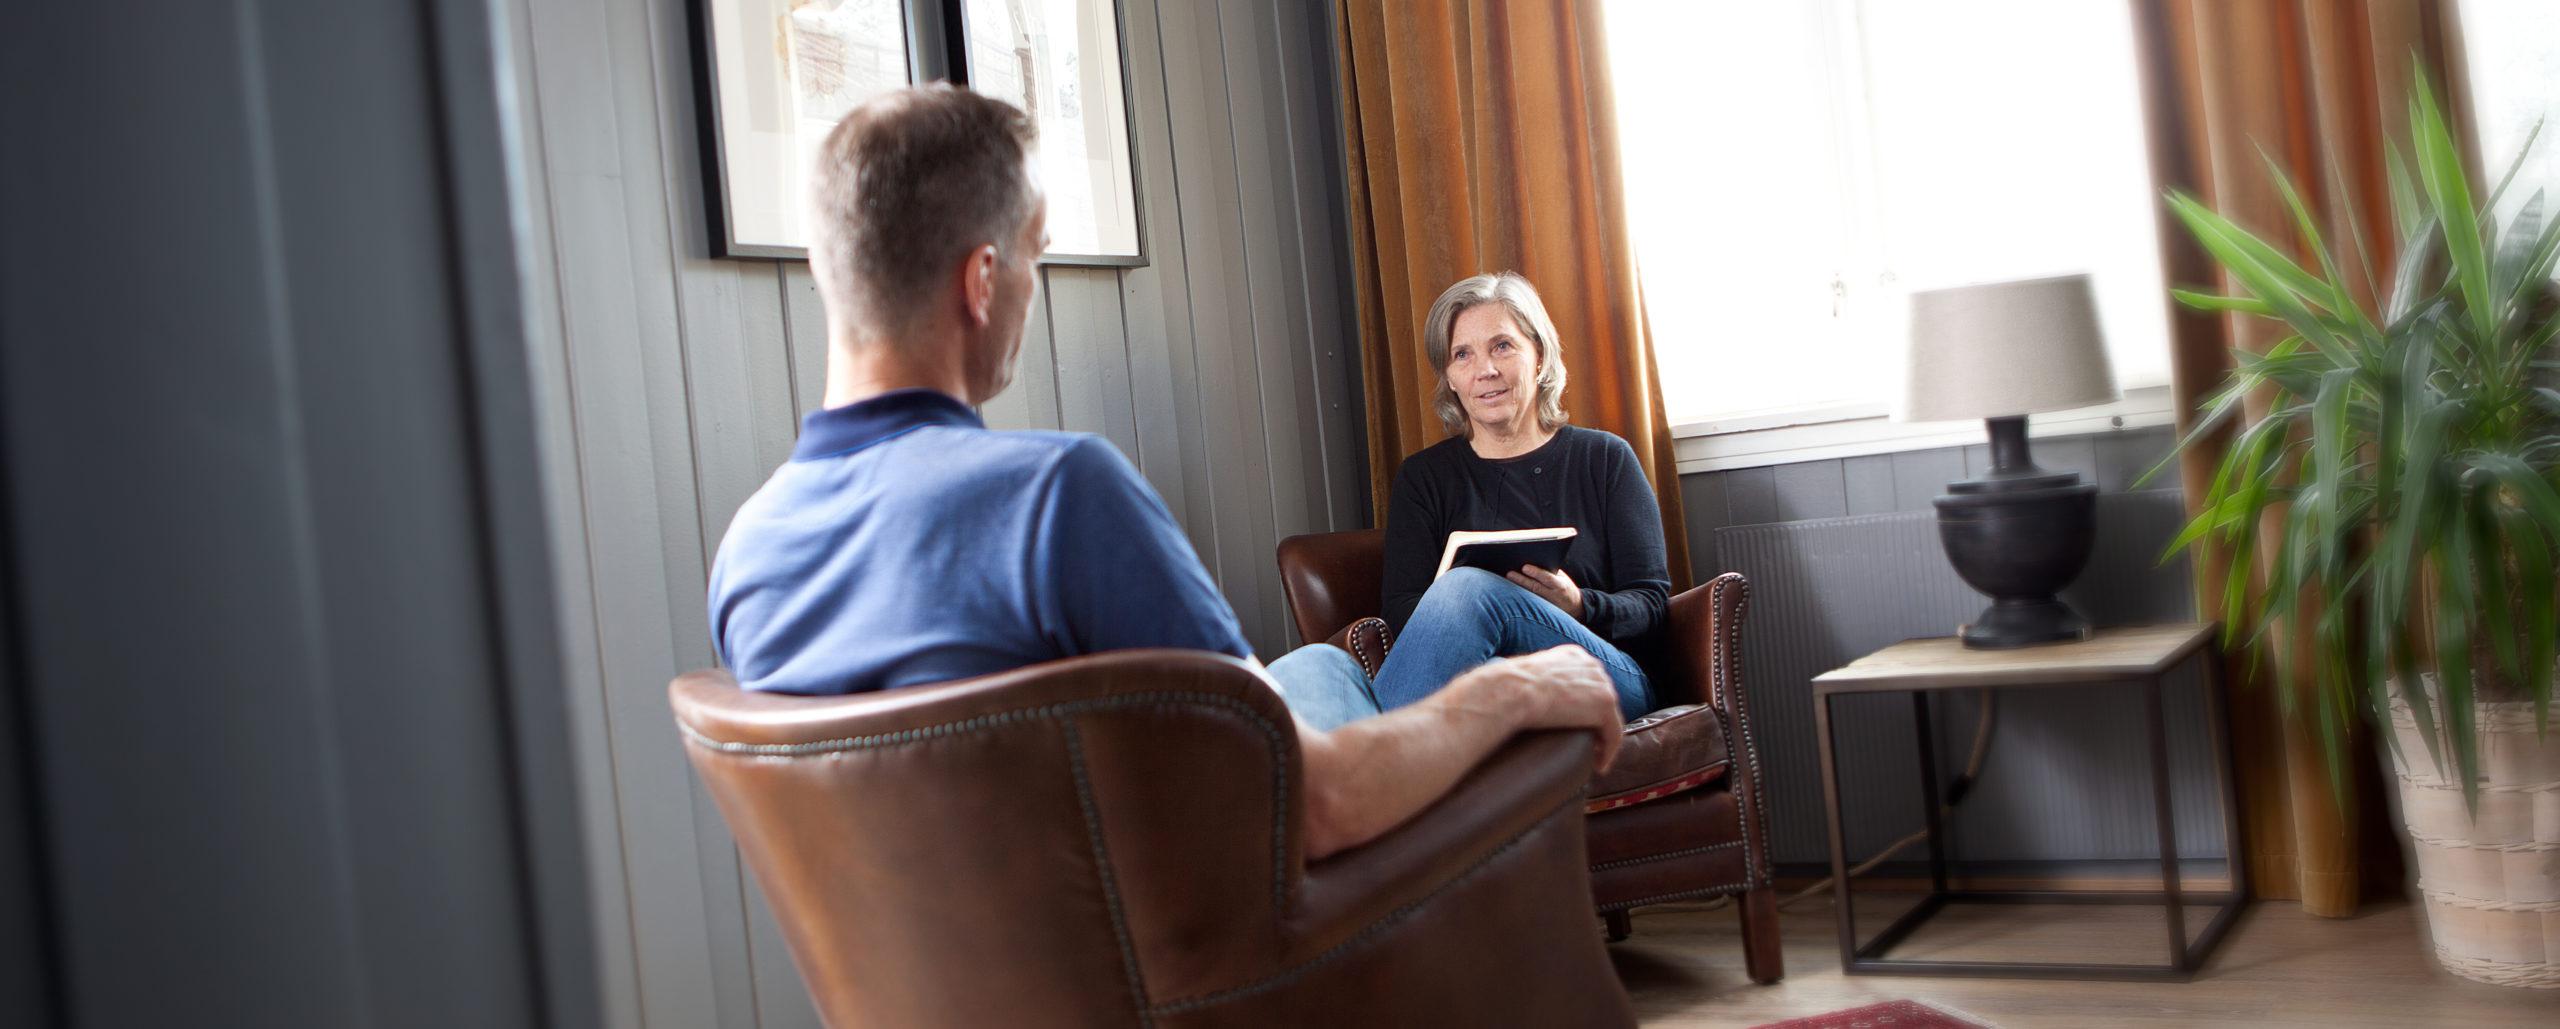 Terapeut Kia og pasient under metakognitiv terapi, Snøhetta Terapi